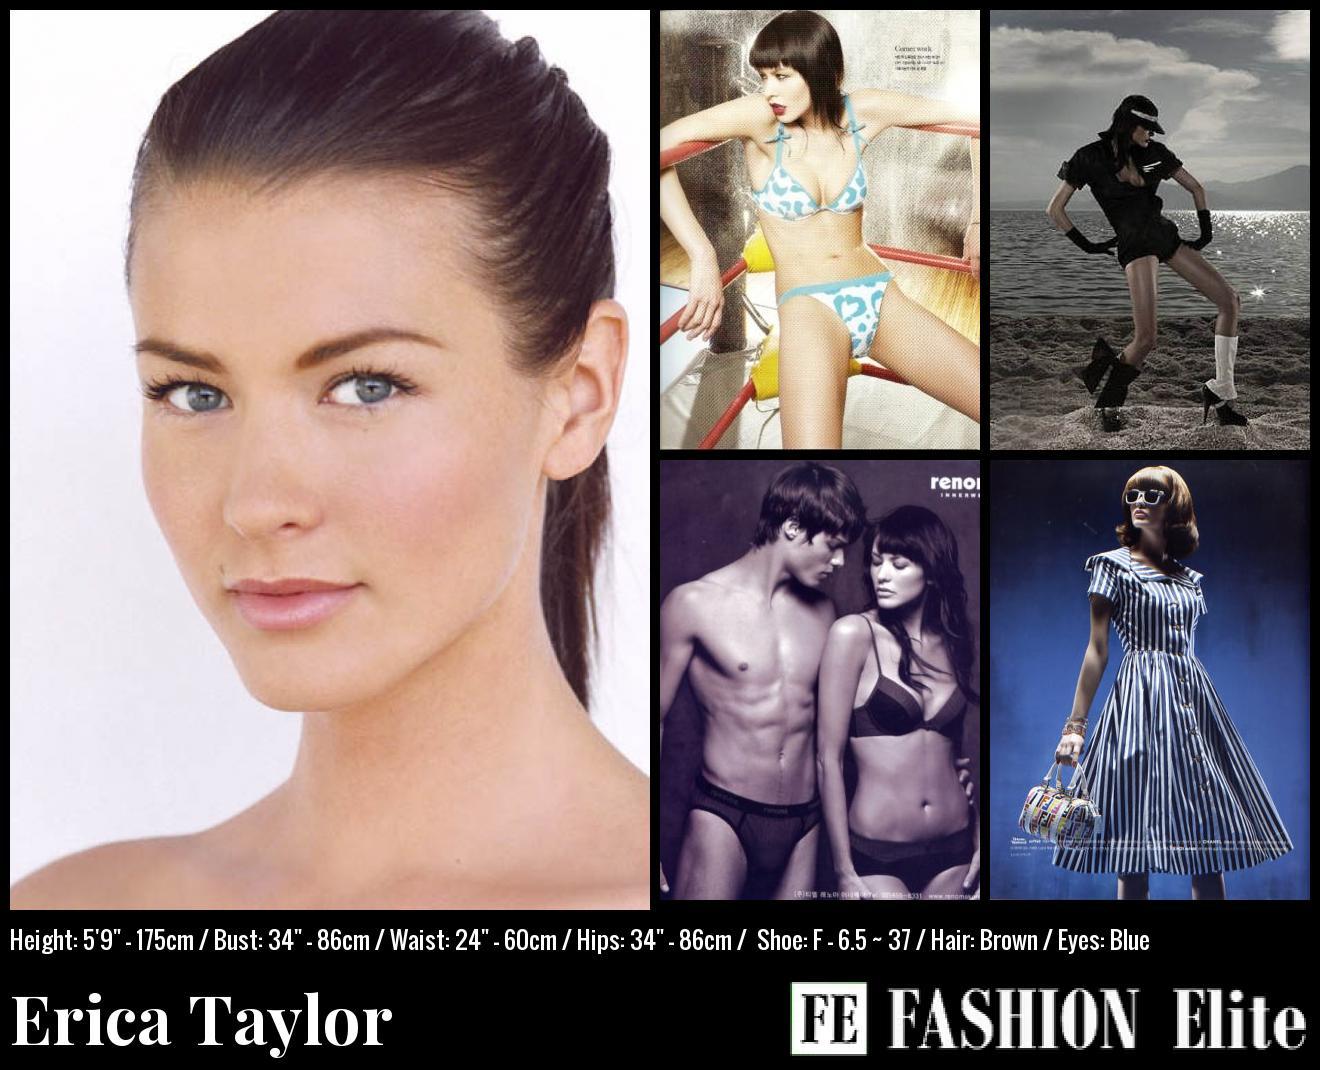 Erica Taylor Comp Card